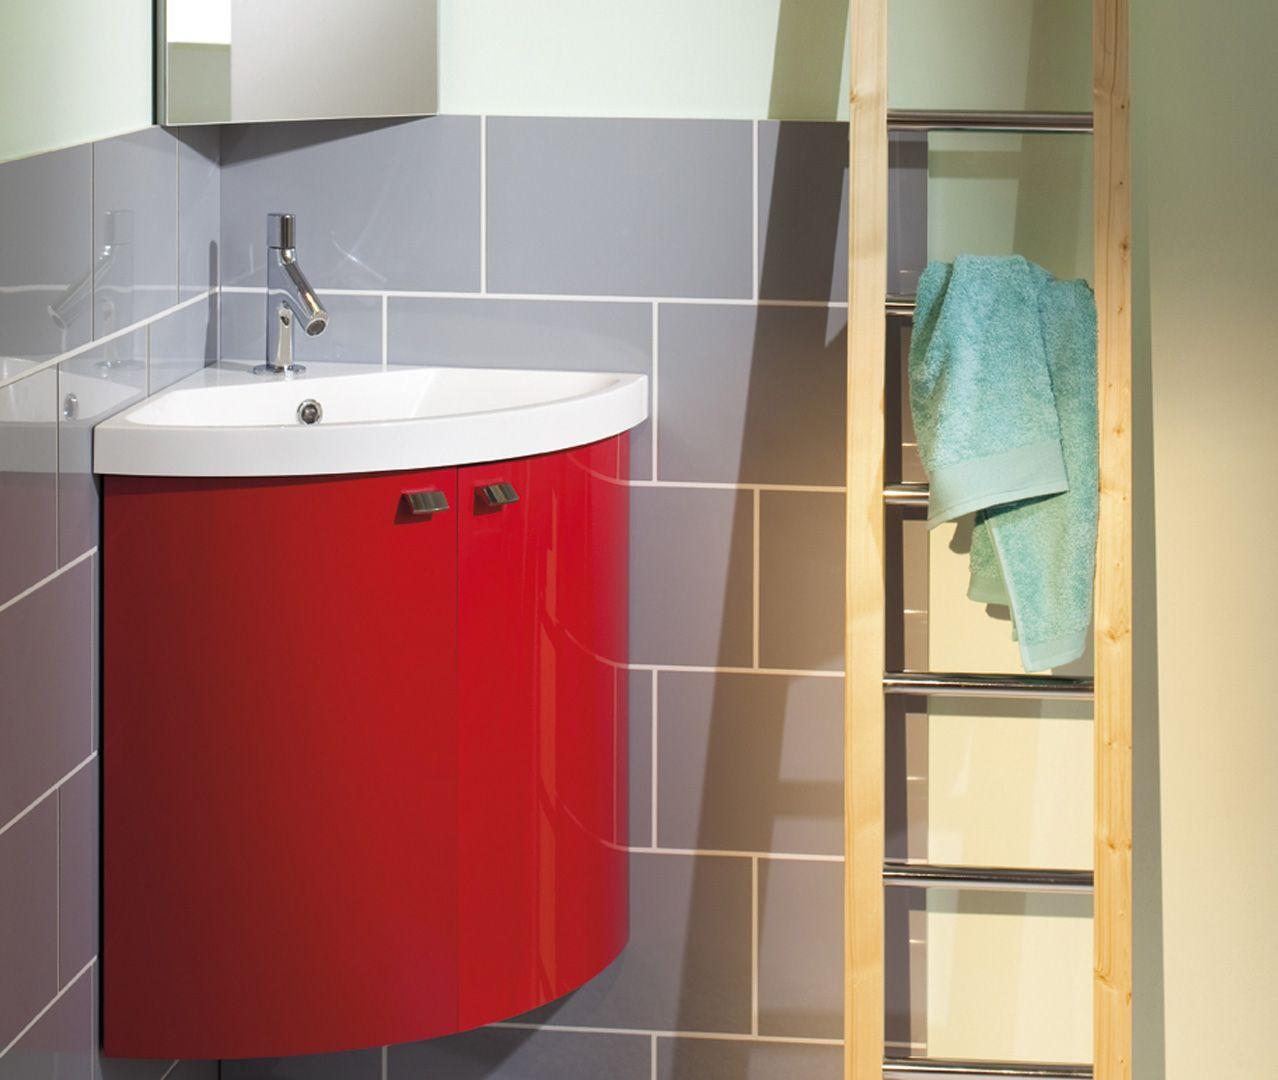 Meuble Salle De Bain Sanijura Xs ~ lave mains meuble d angle laqu pop sanijura deco toilettes